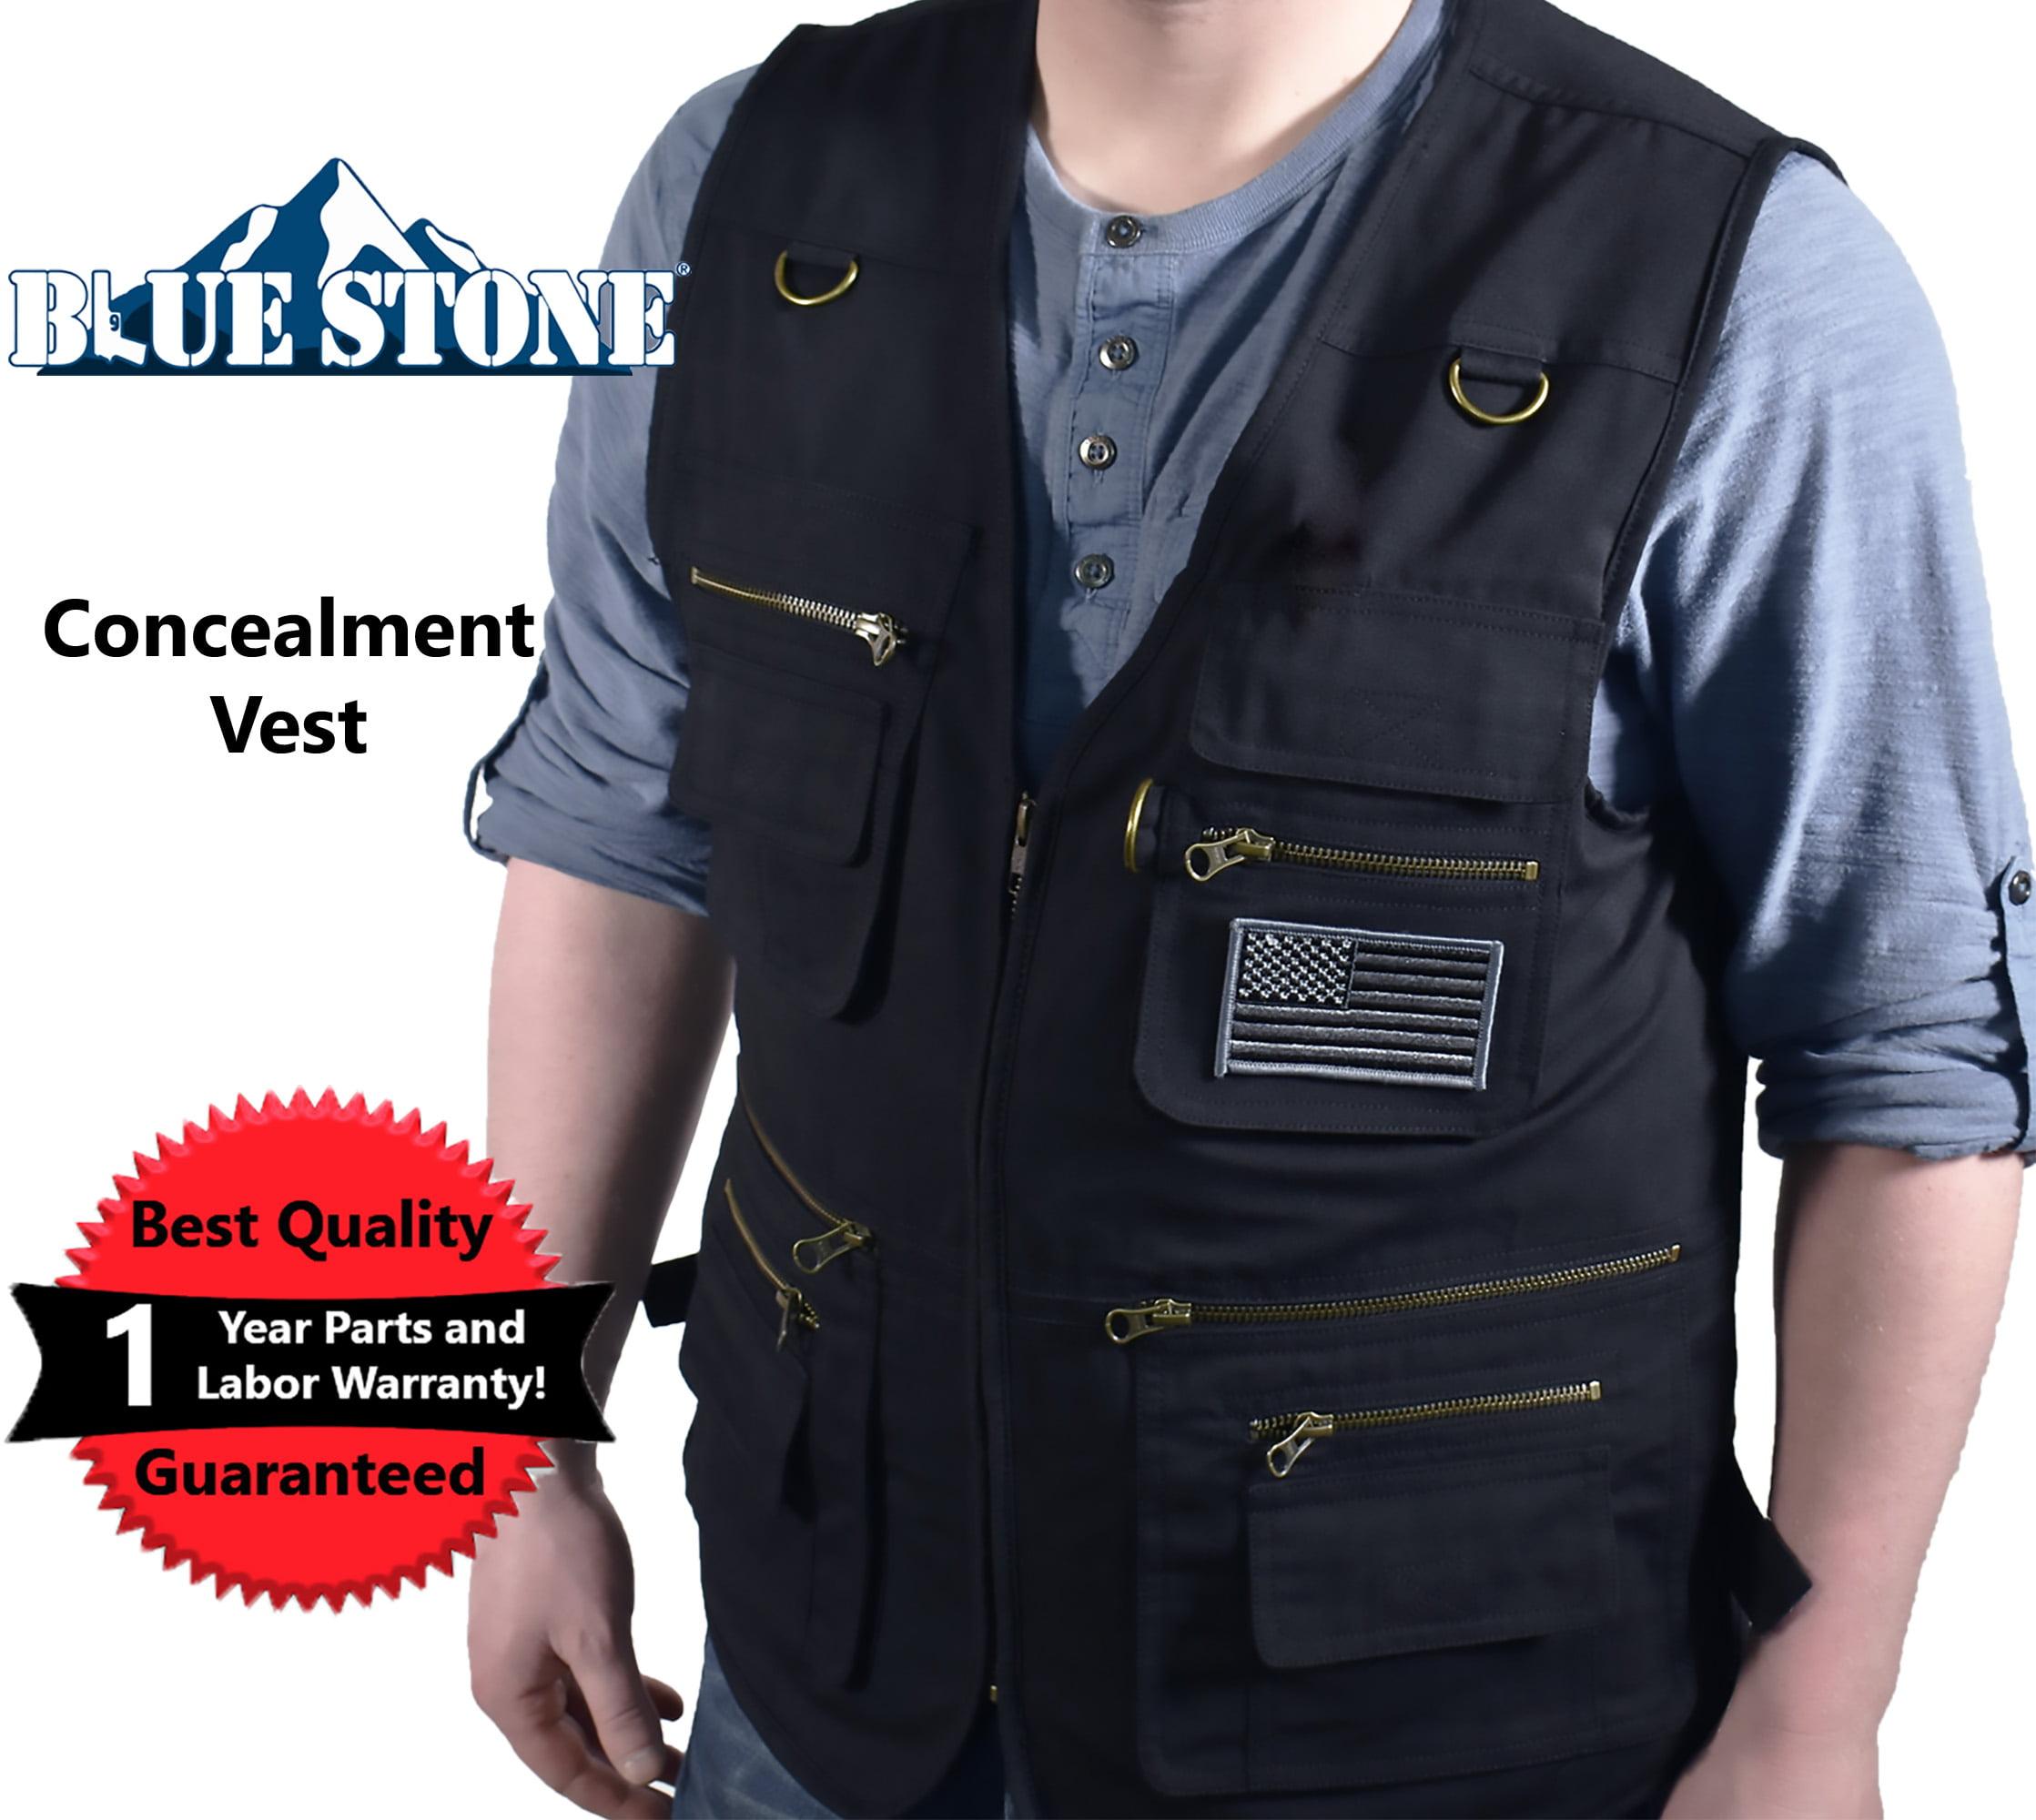 Blue Stone Safety Products Large Black Concealment Vest| Fishing Vest| Hunting Vest| Travel Vest| Photography Vest|... by Supplier Generic